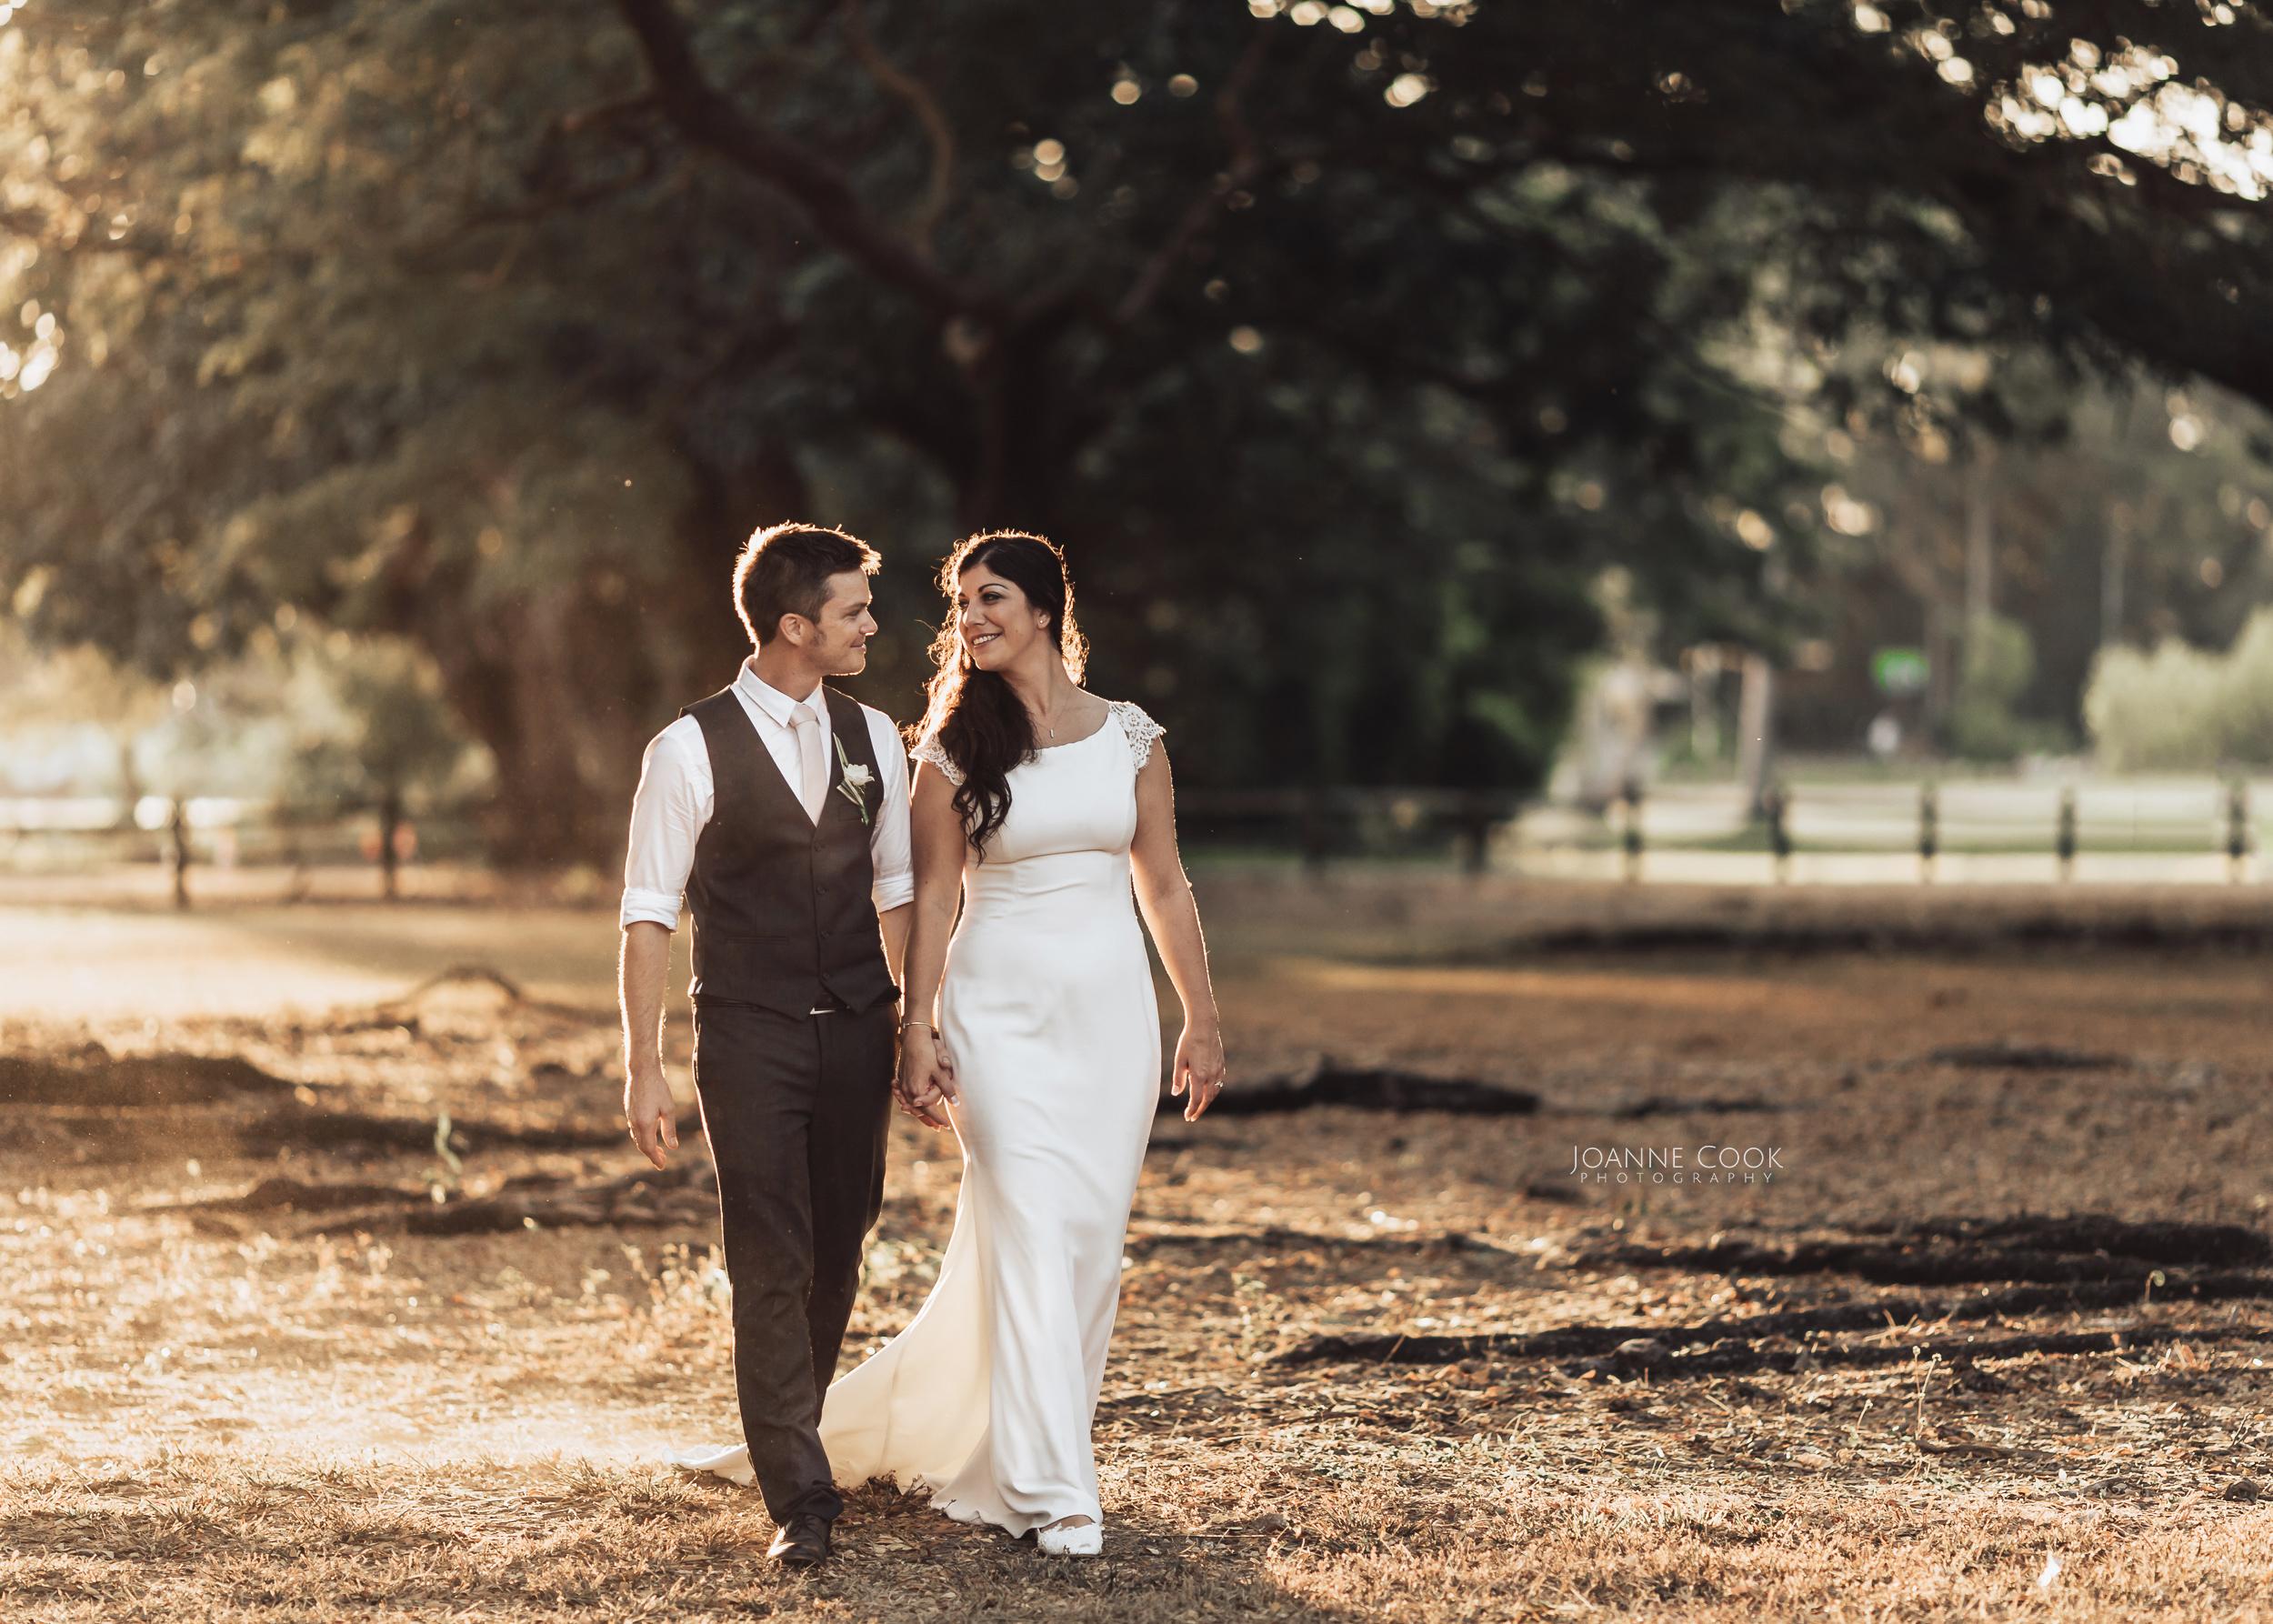 Darwin wedding photographer joanne cook photography.jpg